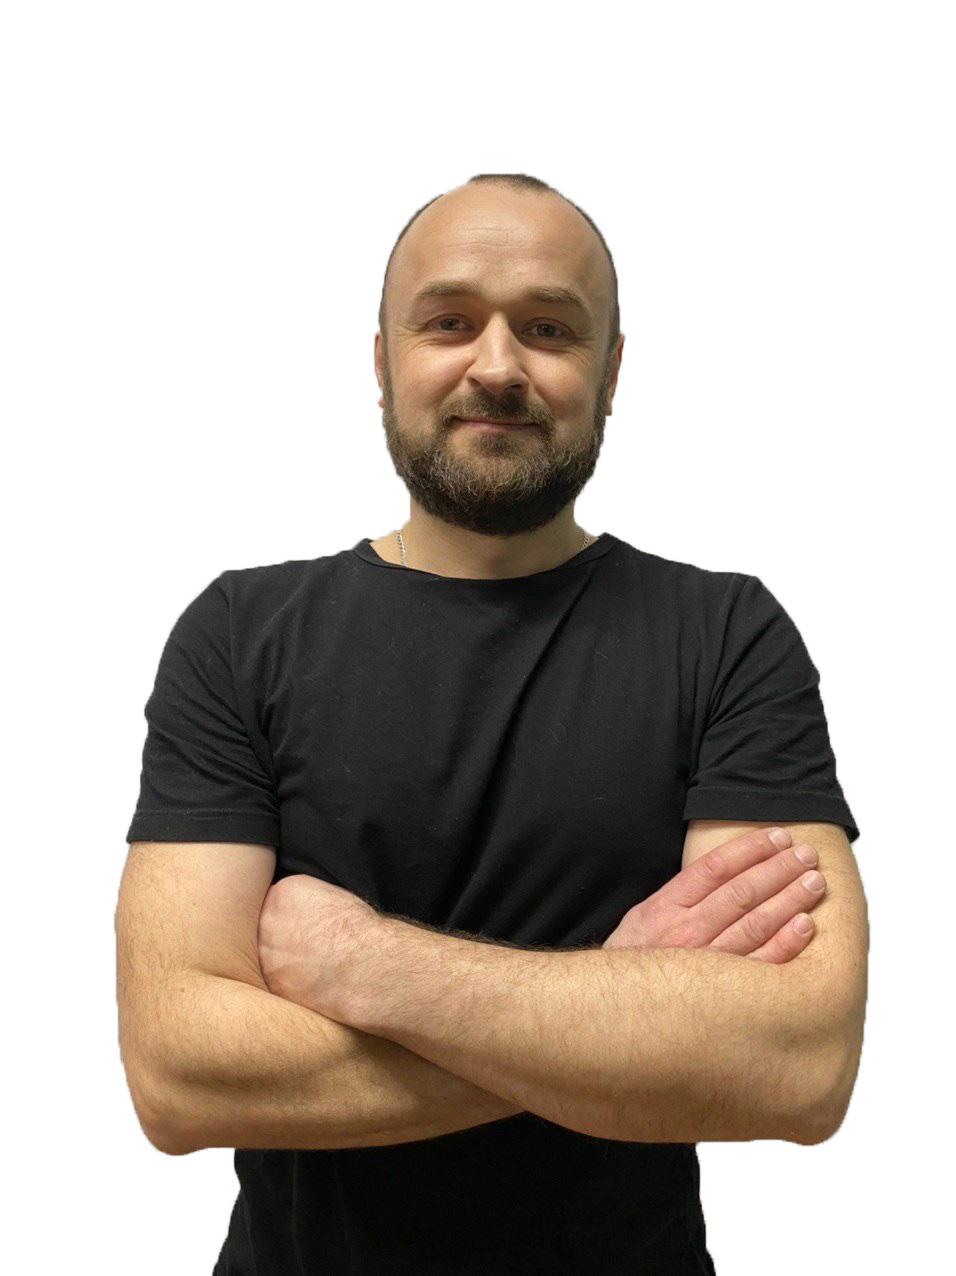 Юрий Анатольевич Саврук